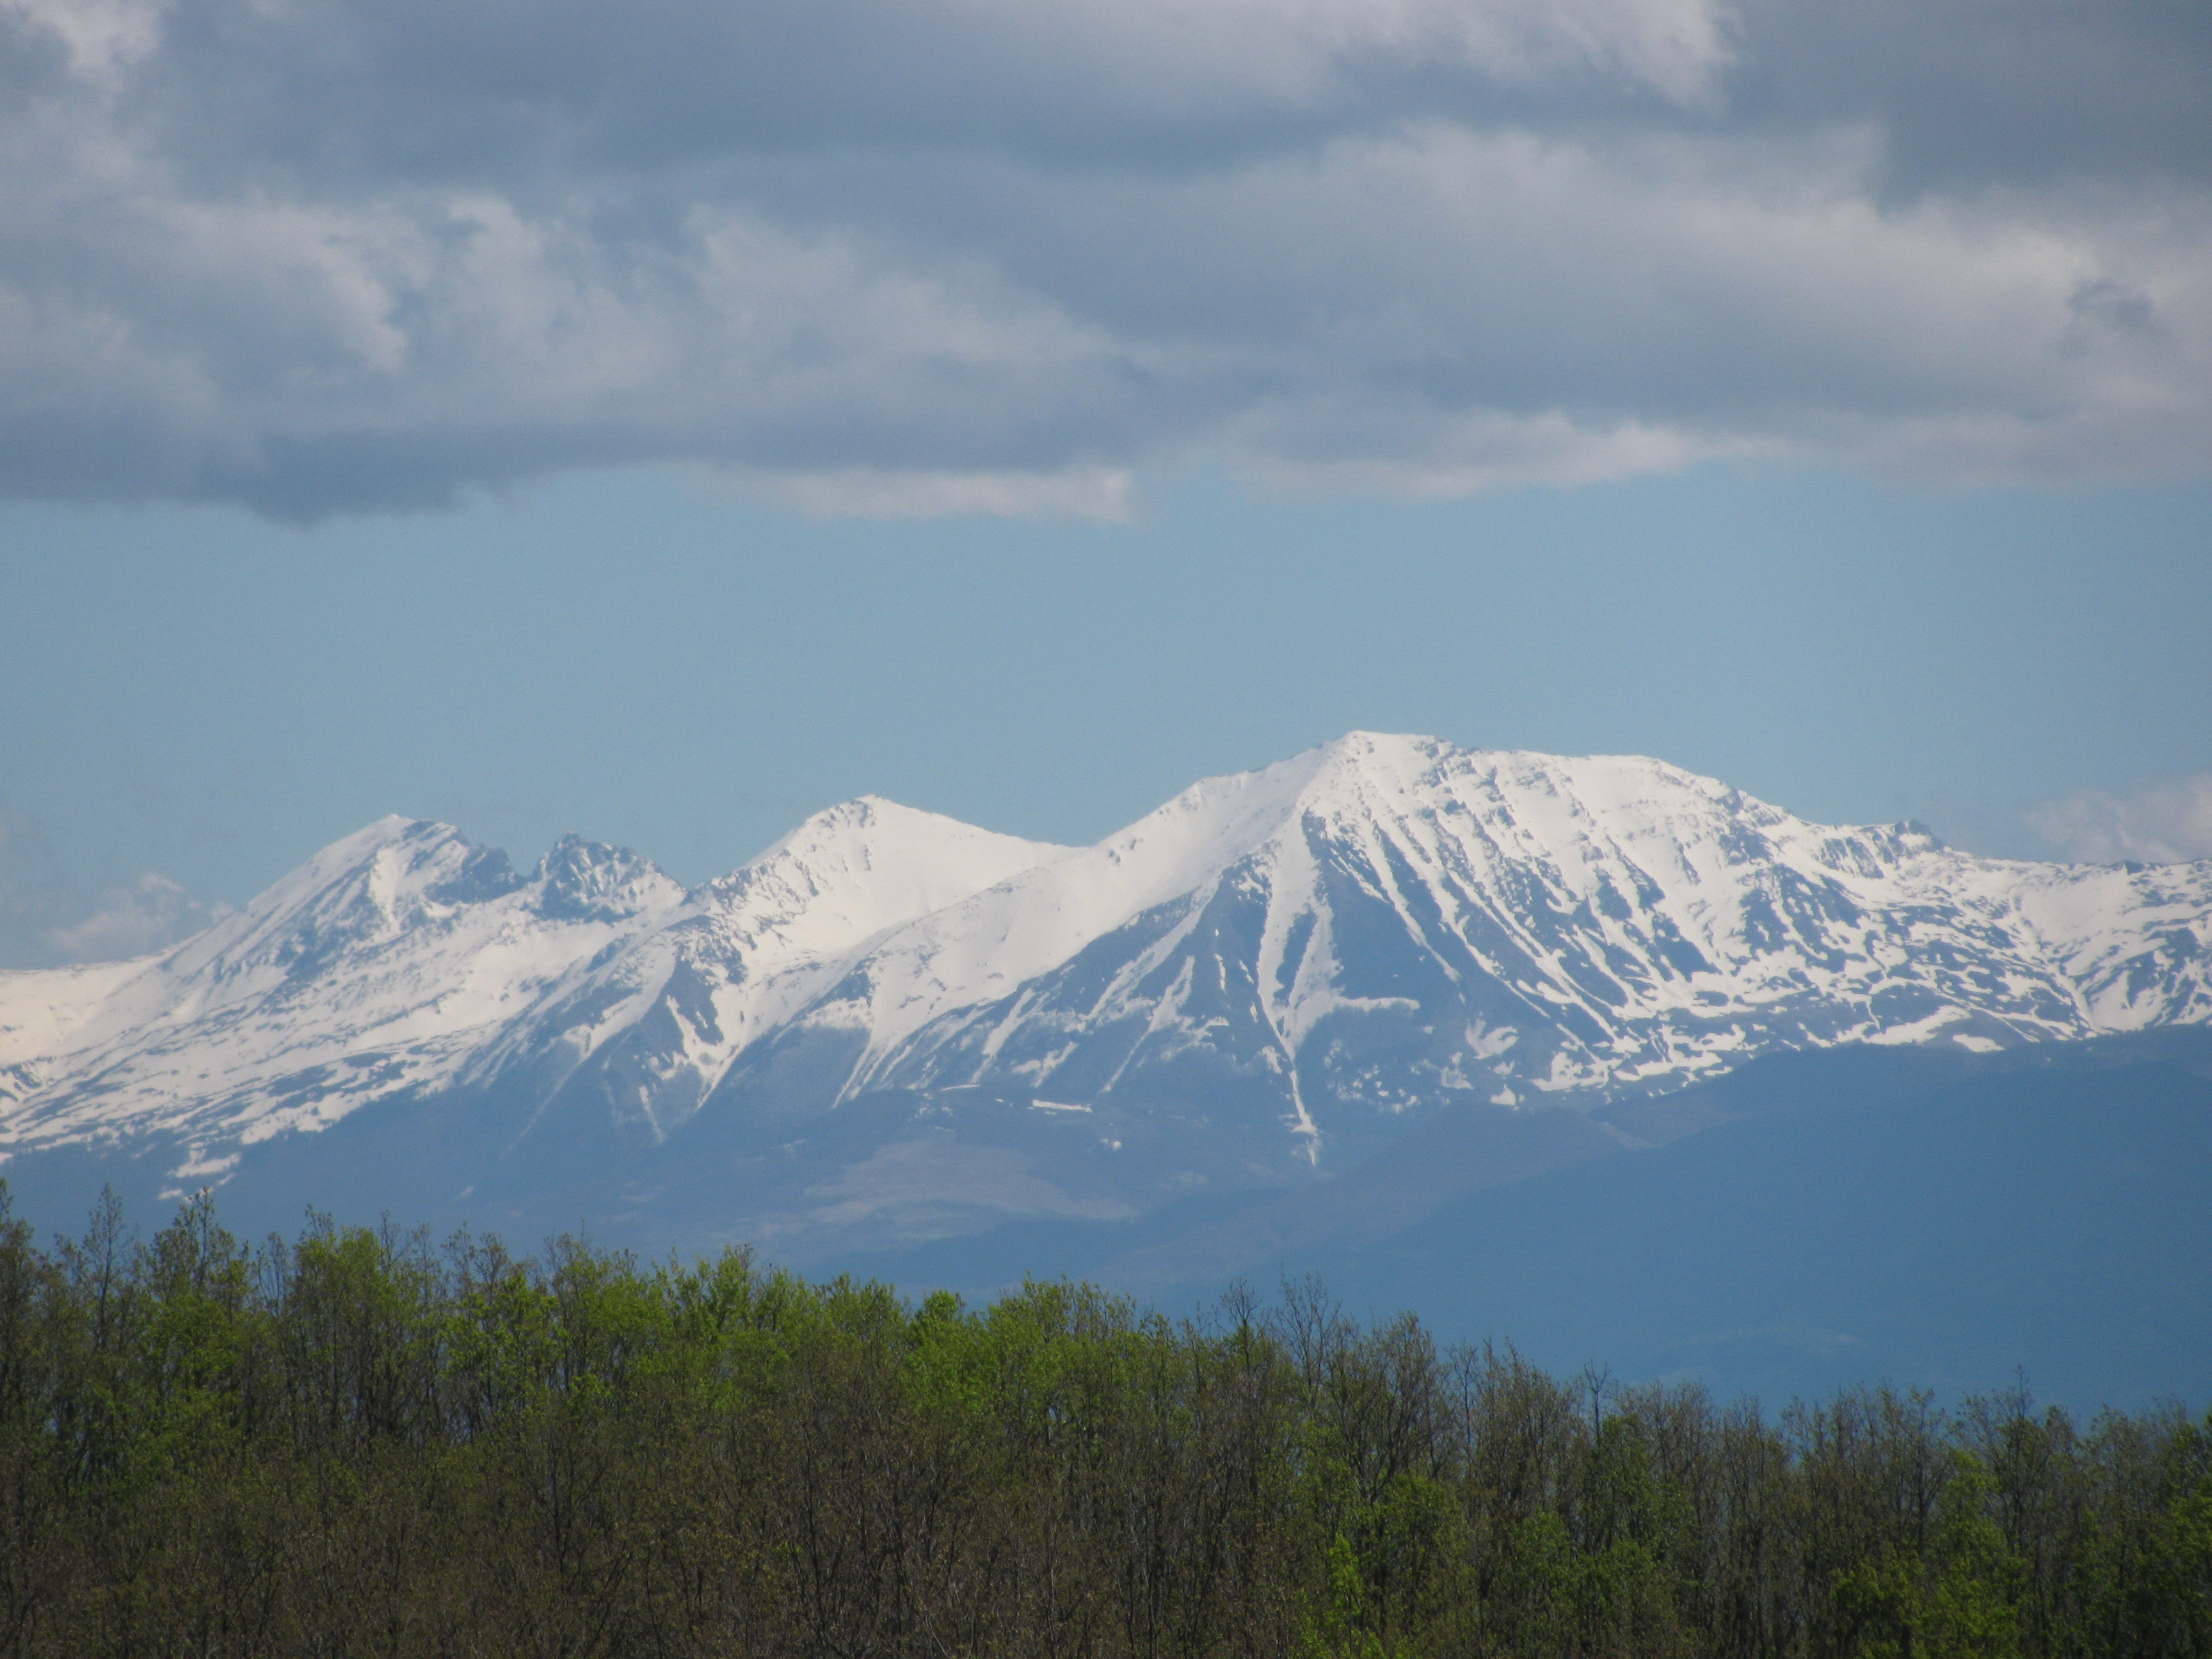 Foto malet e sharrit 91